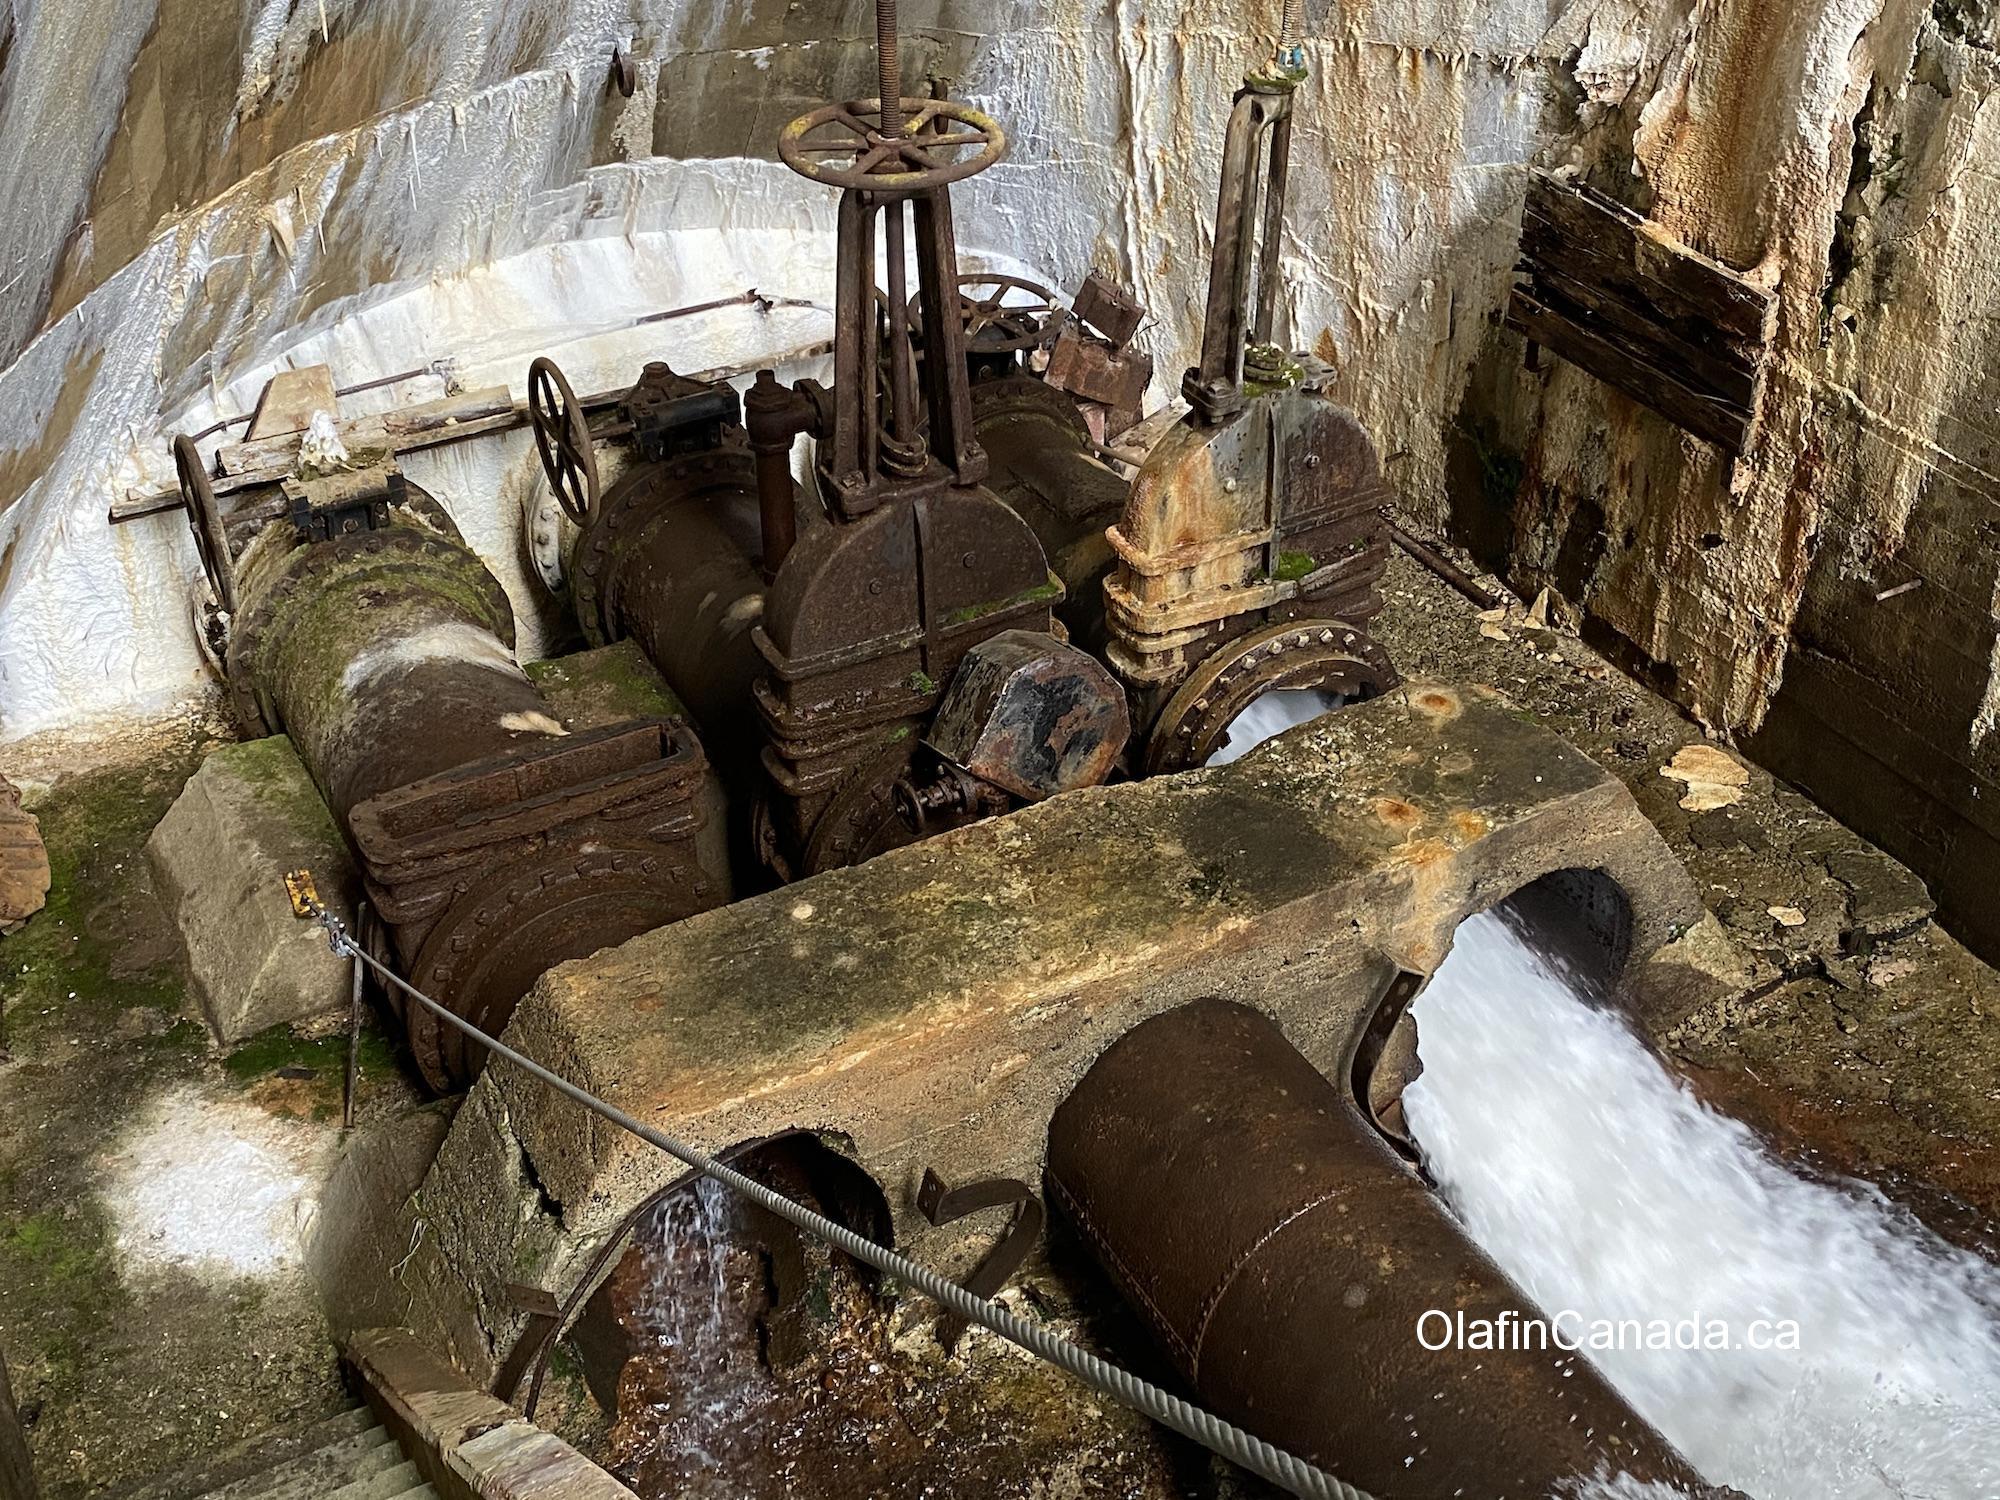 A working water pump in the dam at Anyox #olafincanada #britishcolumbia #discoverbc #abandonedbc #anyox #dam